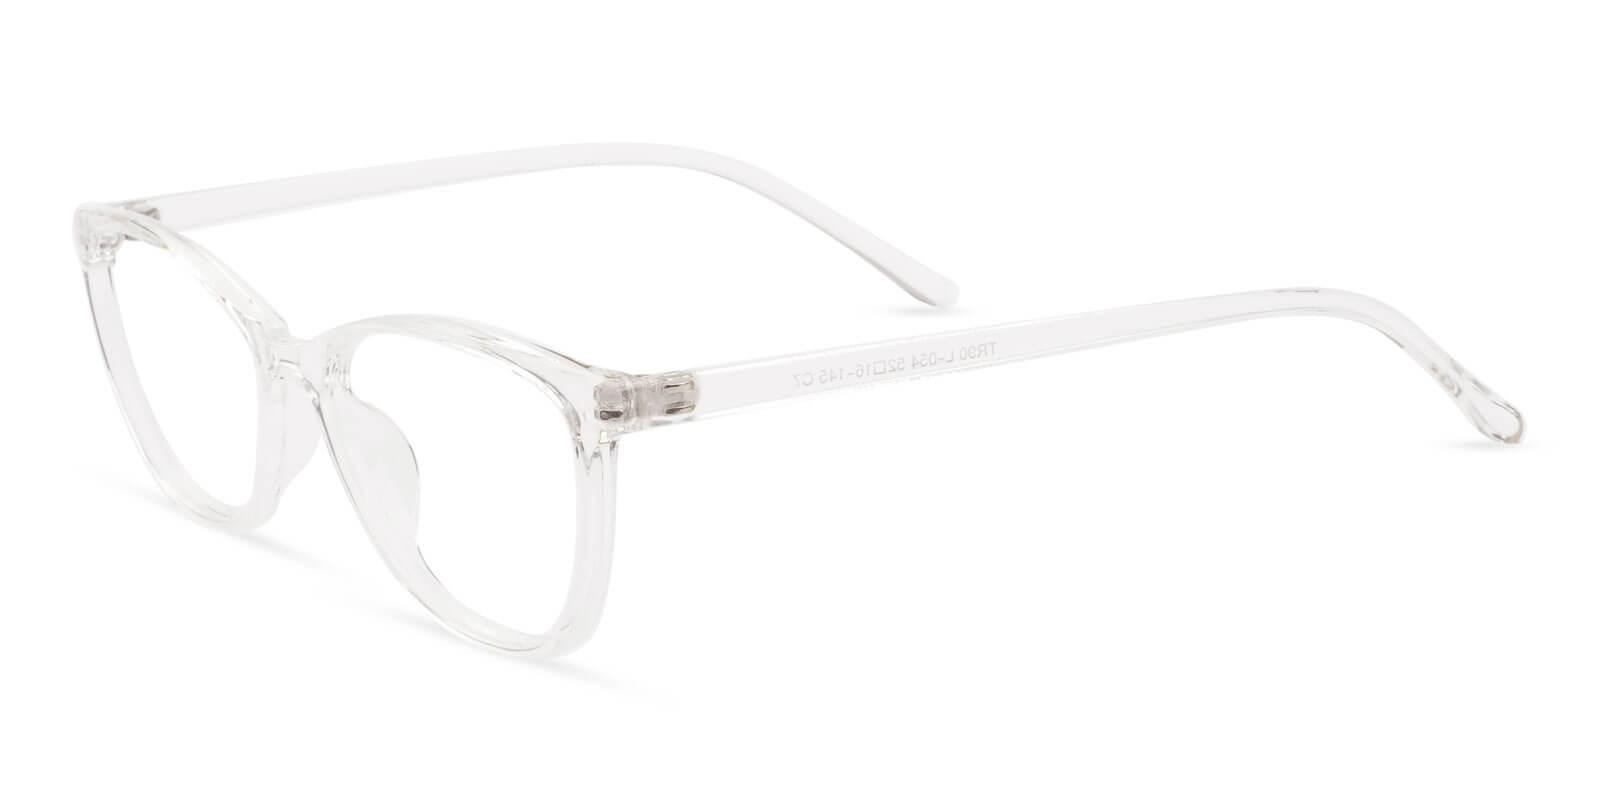 Percy Translucent TR Eyeglasses , Lightweight , UniversalBridgeFit Frames from ABBE Glasses